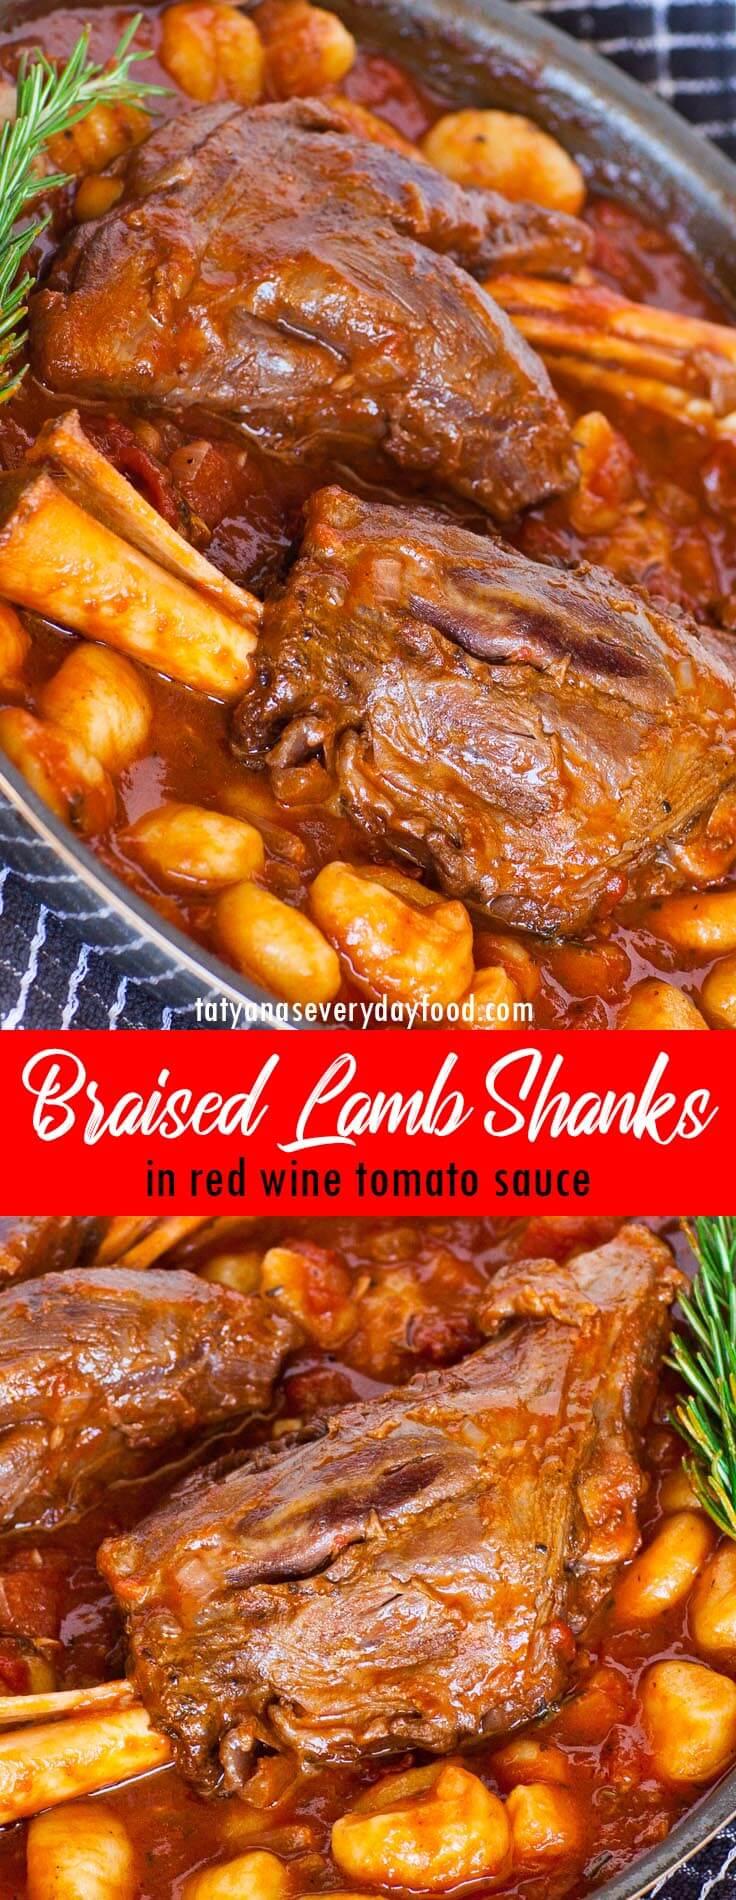 Easy Braised Lamb Shanks video recipe